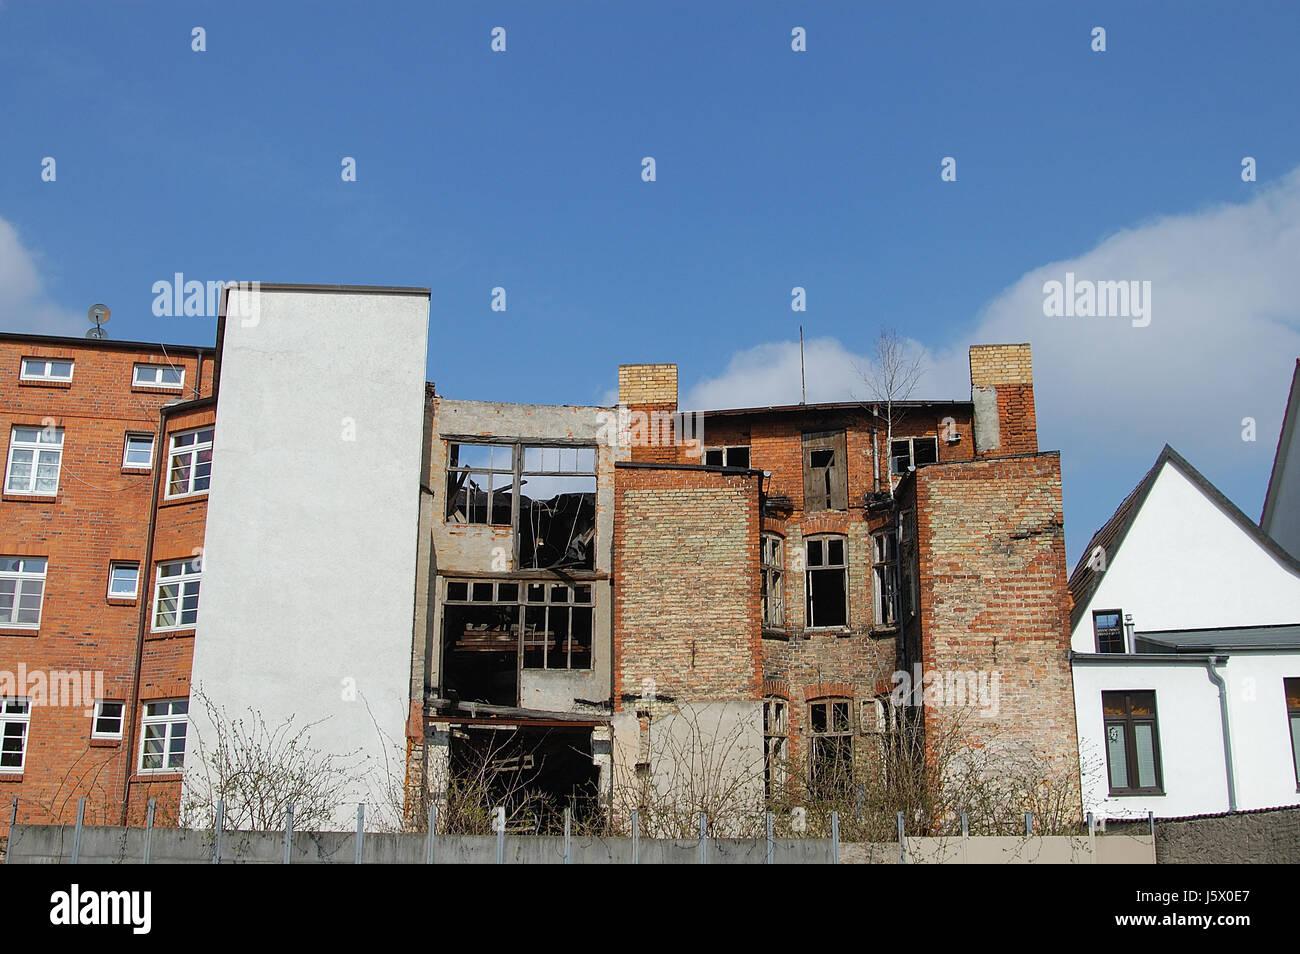 backyard in wismar - Stock Image